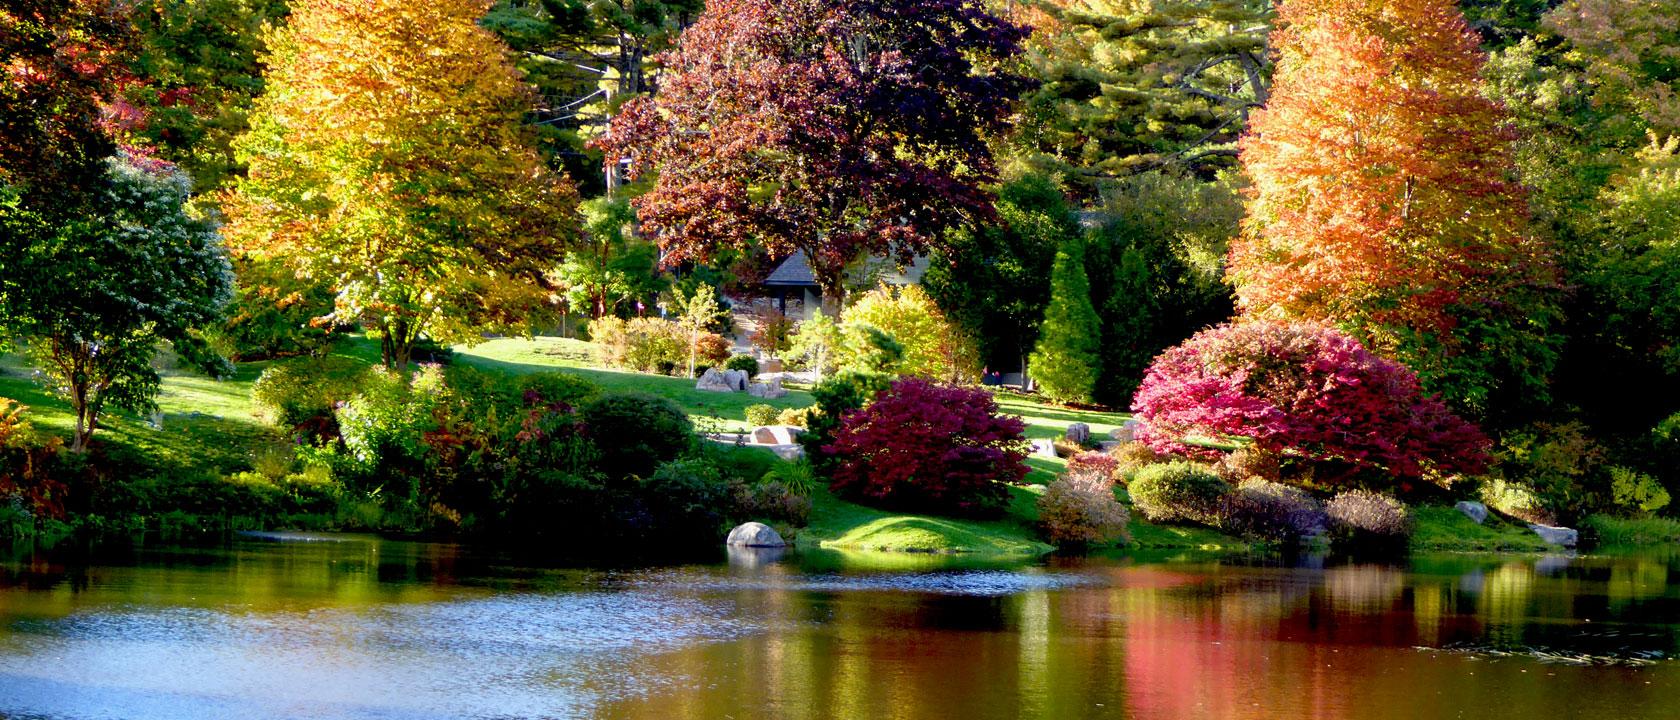 Asticou Azalea Gardens created by Charles K. Savage, Mt Desert Island, Maine - by John Patrick.